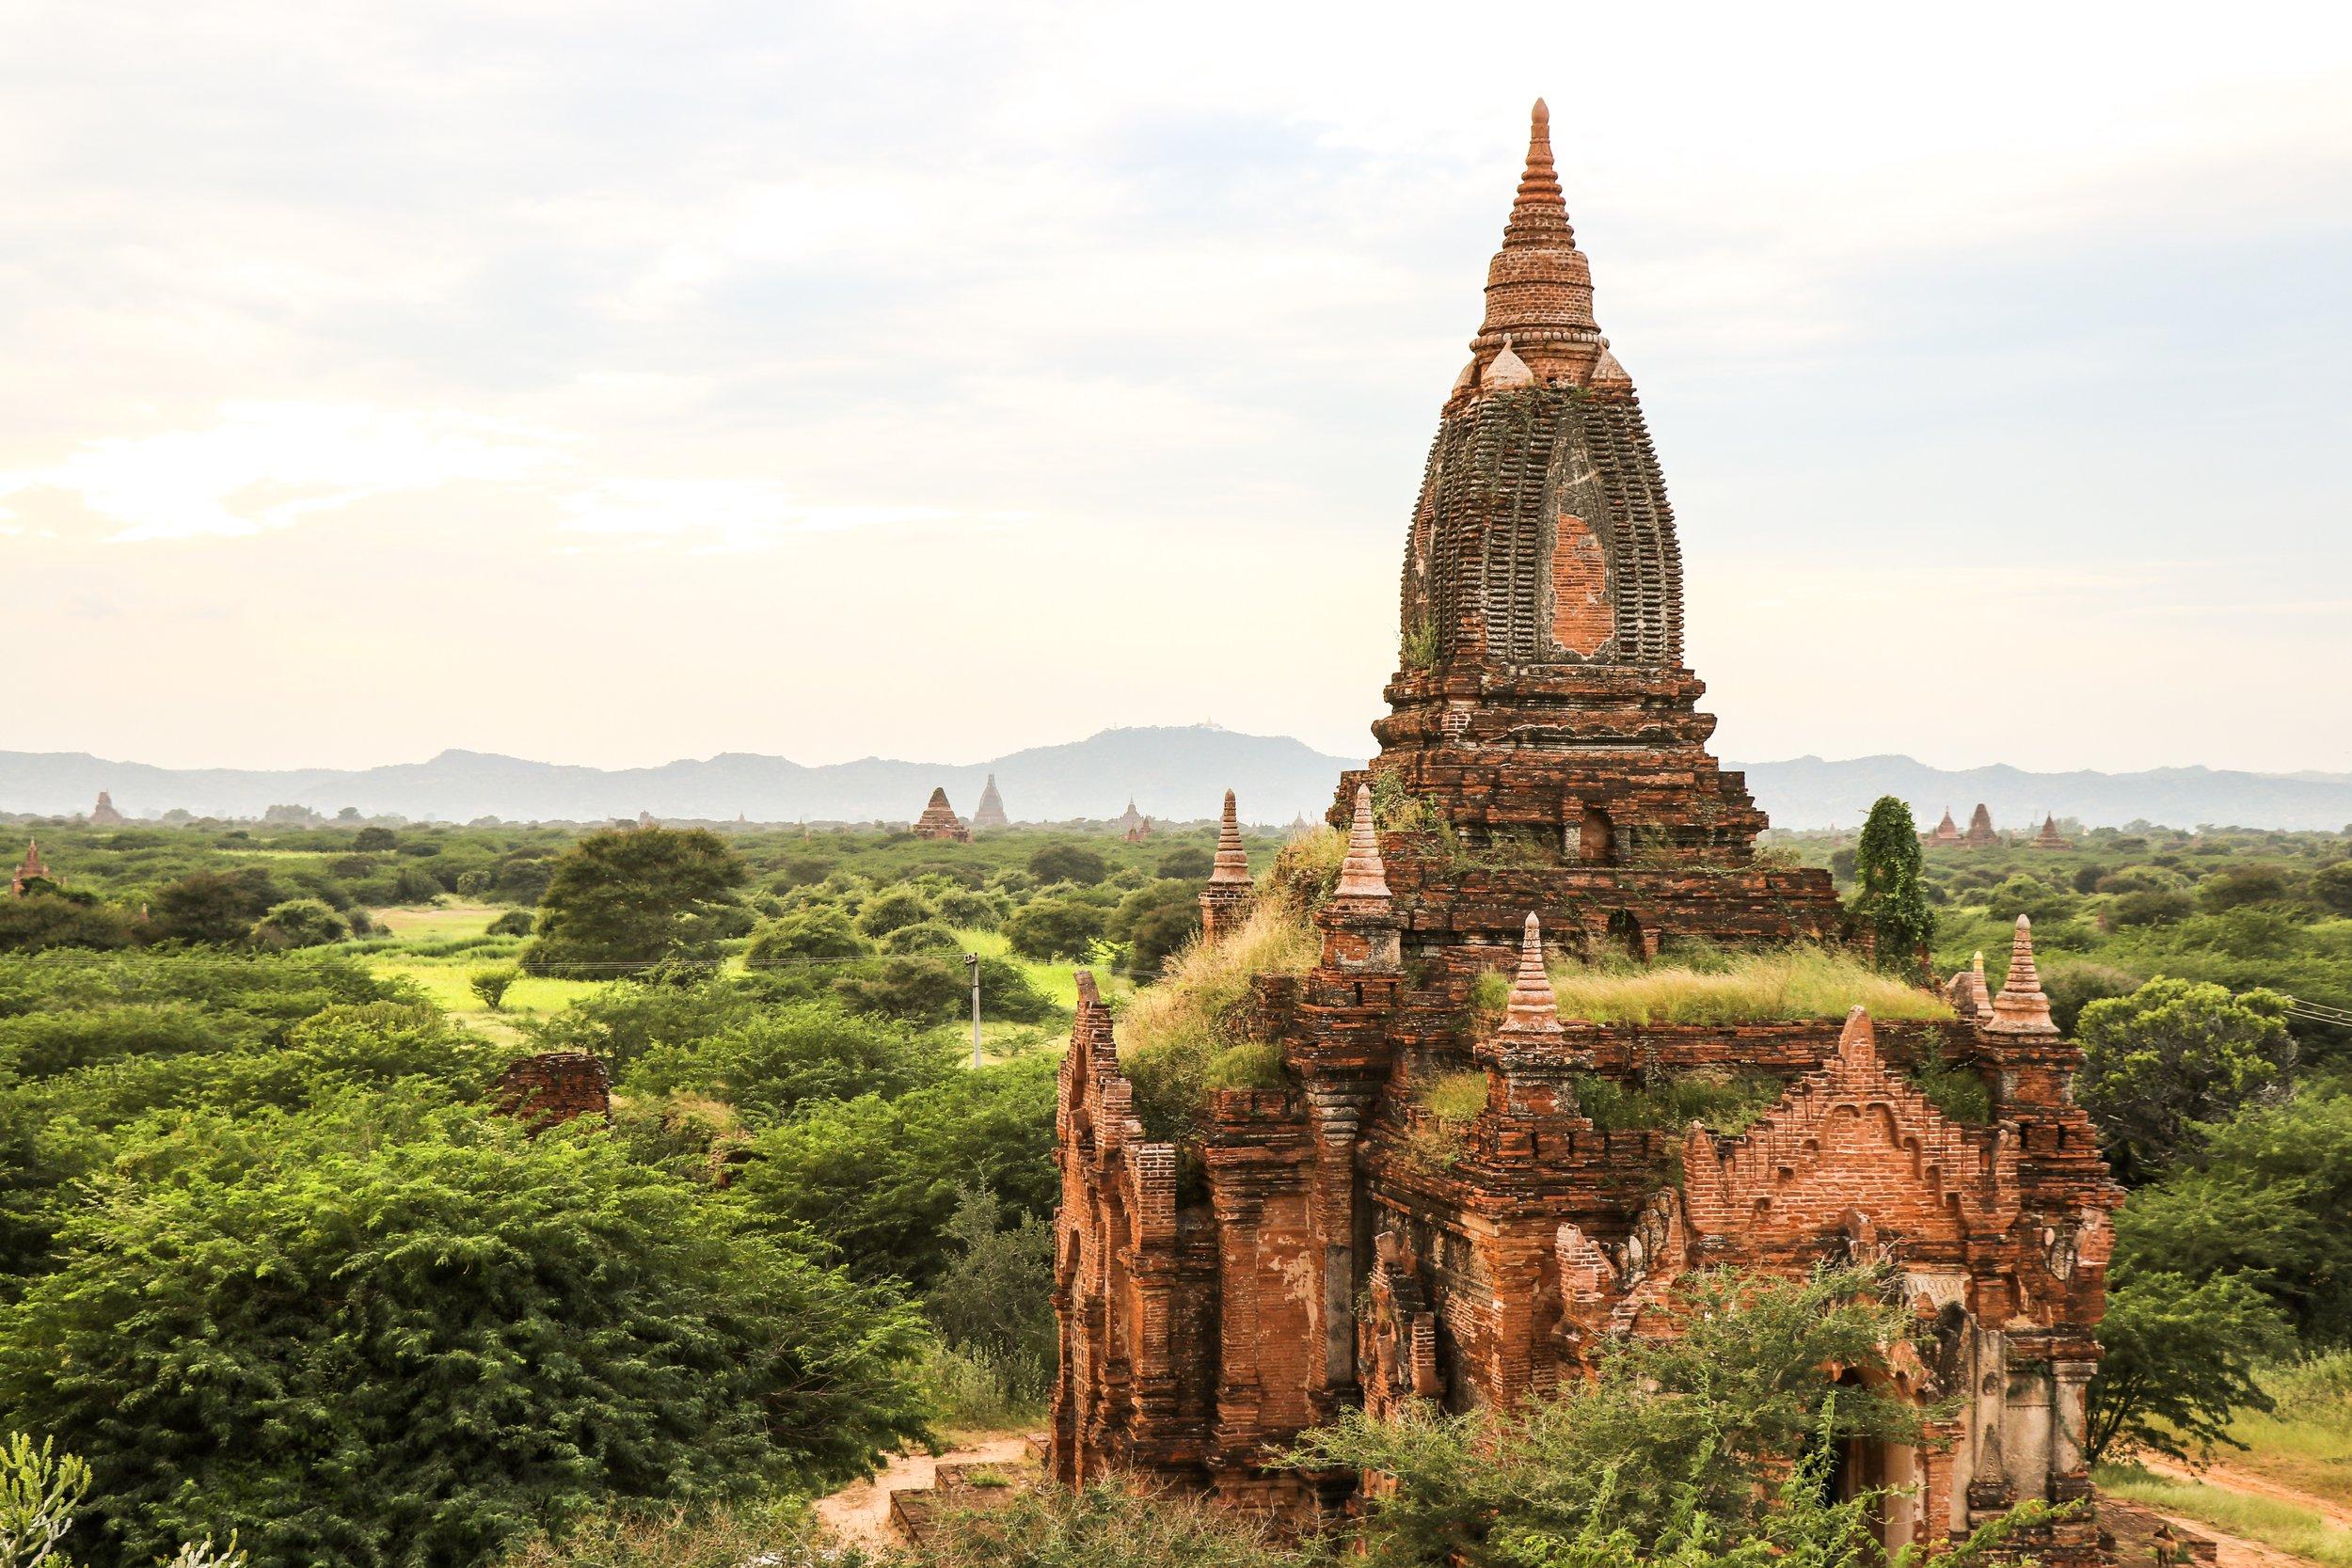 View from the top - Bagan, Myanmar